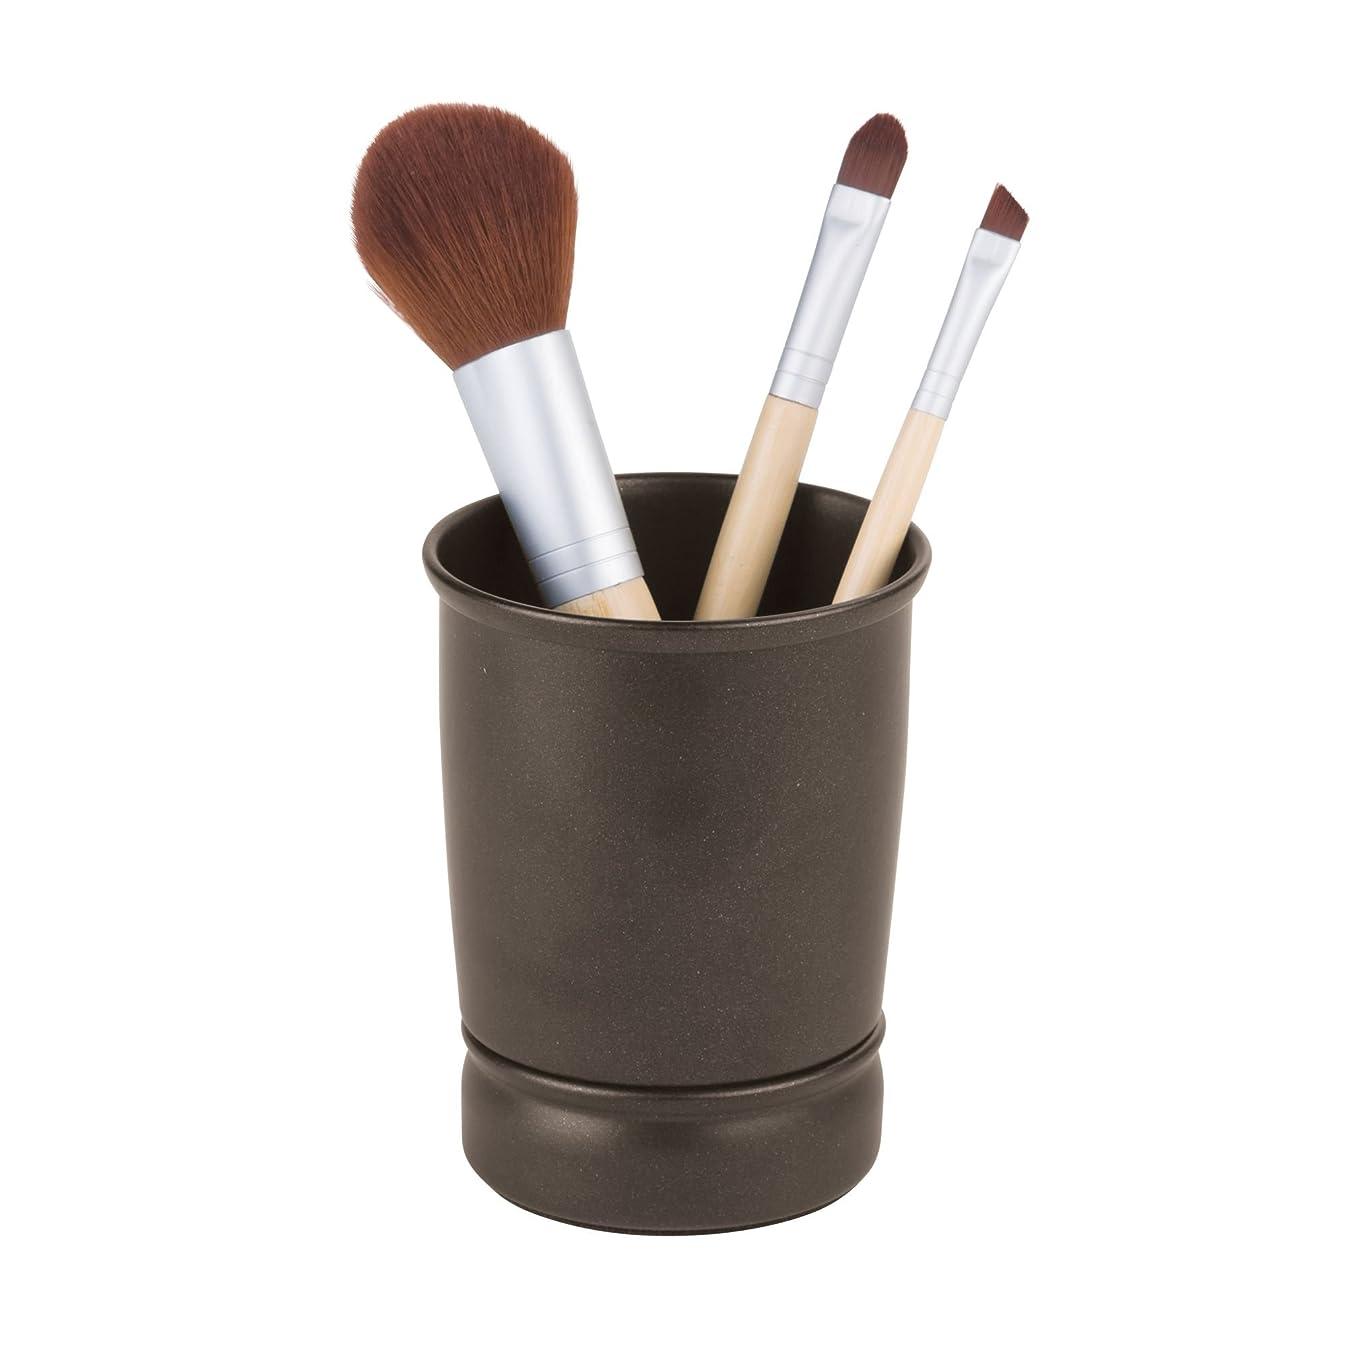 InterDesign York Metal Tumbler, Makeup Brush Toothbrush Holder for Bathroom, Countertop, Desk, Dorm, College, and Vanity, 3.25